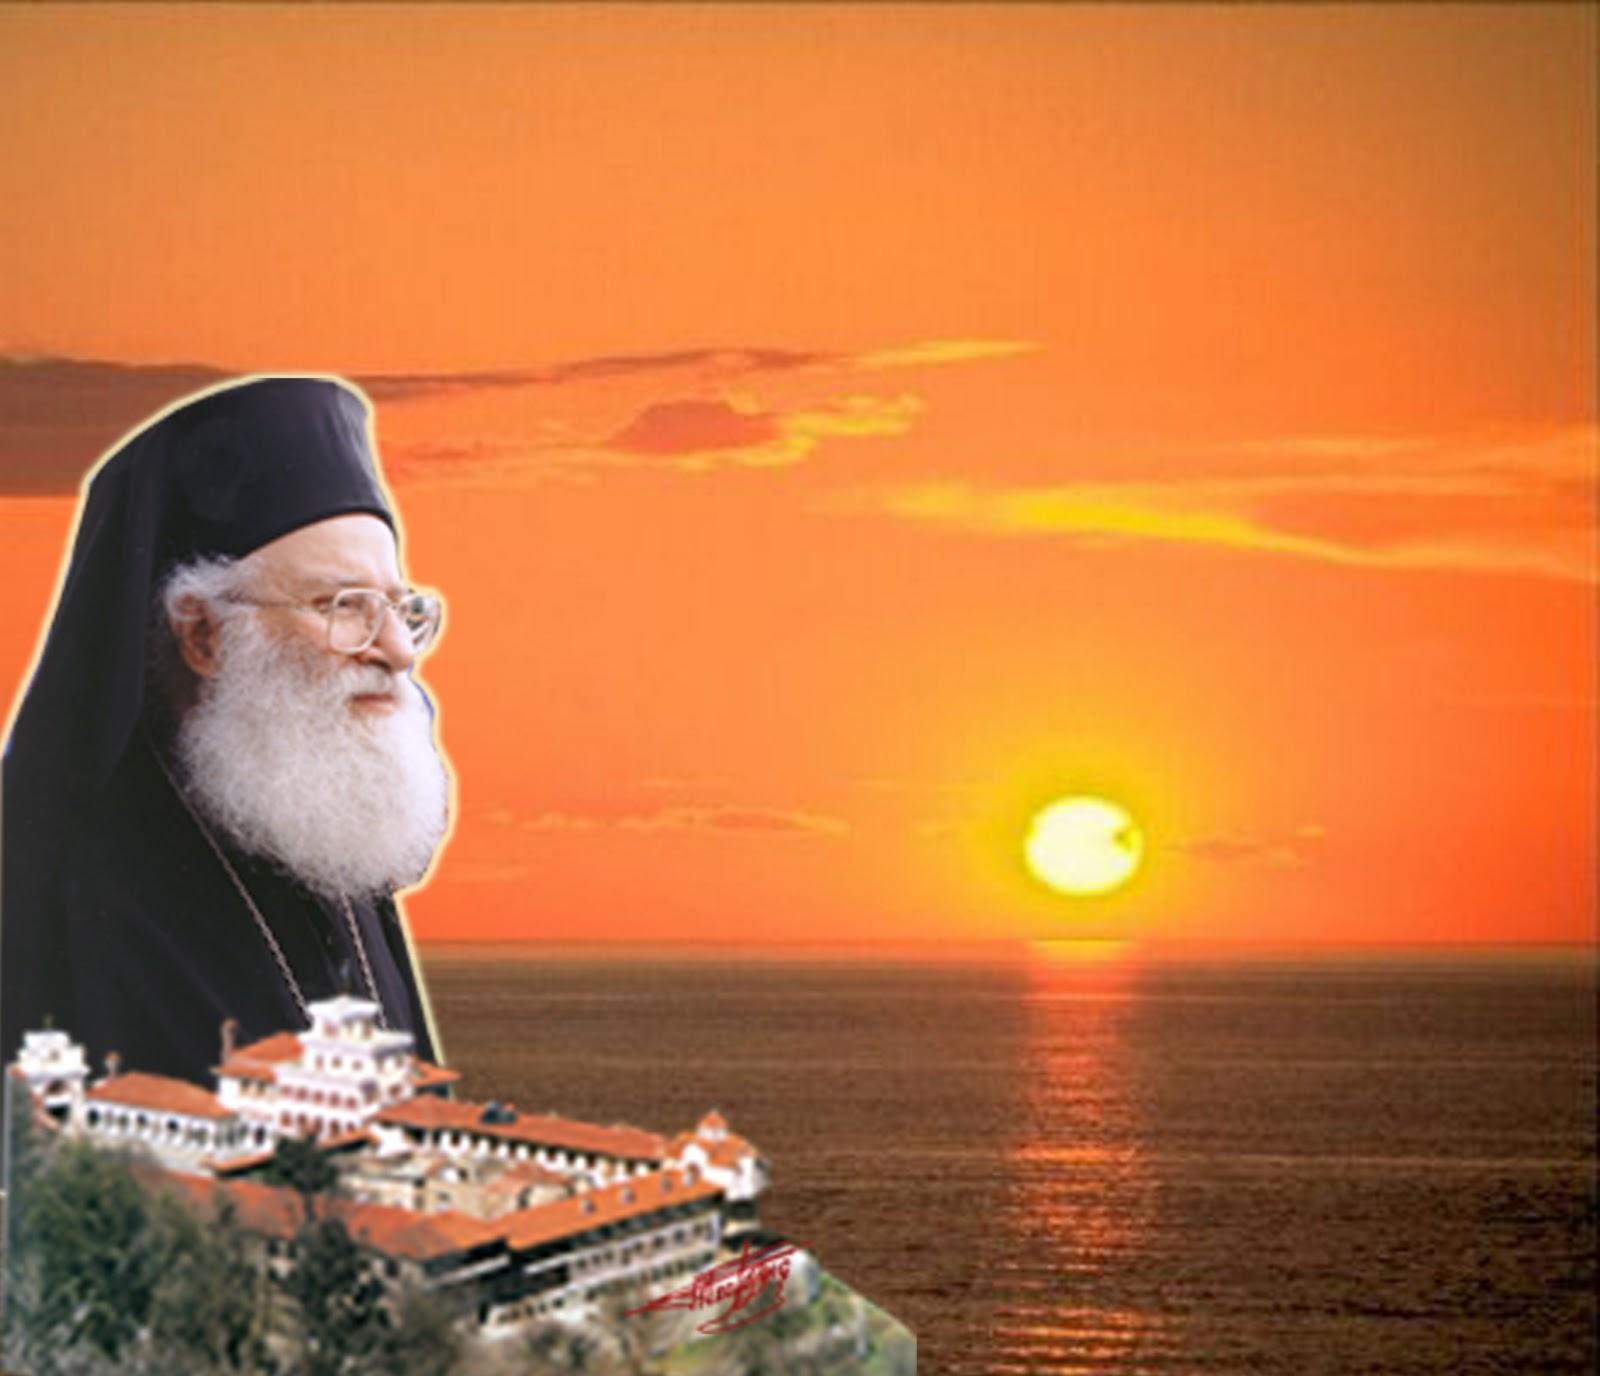 http://www.diaforetiko.gr/wp-content/uploads/2013/03/Untitled-41.jpg